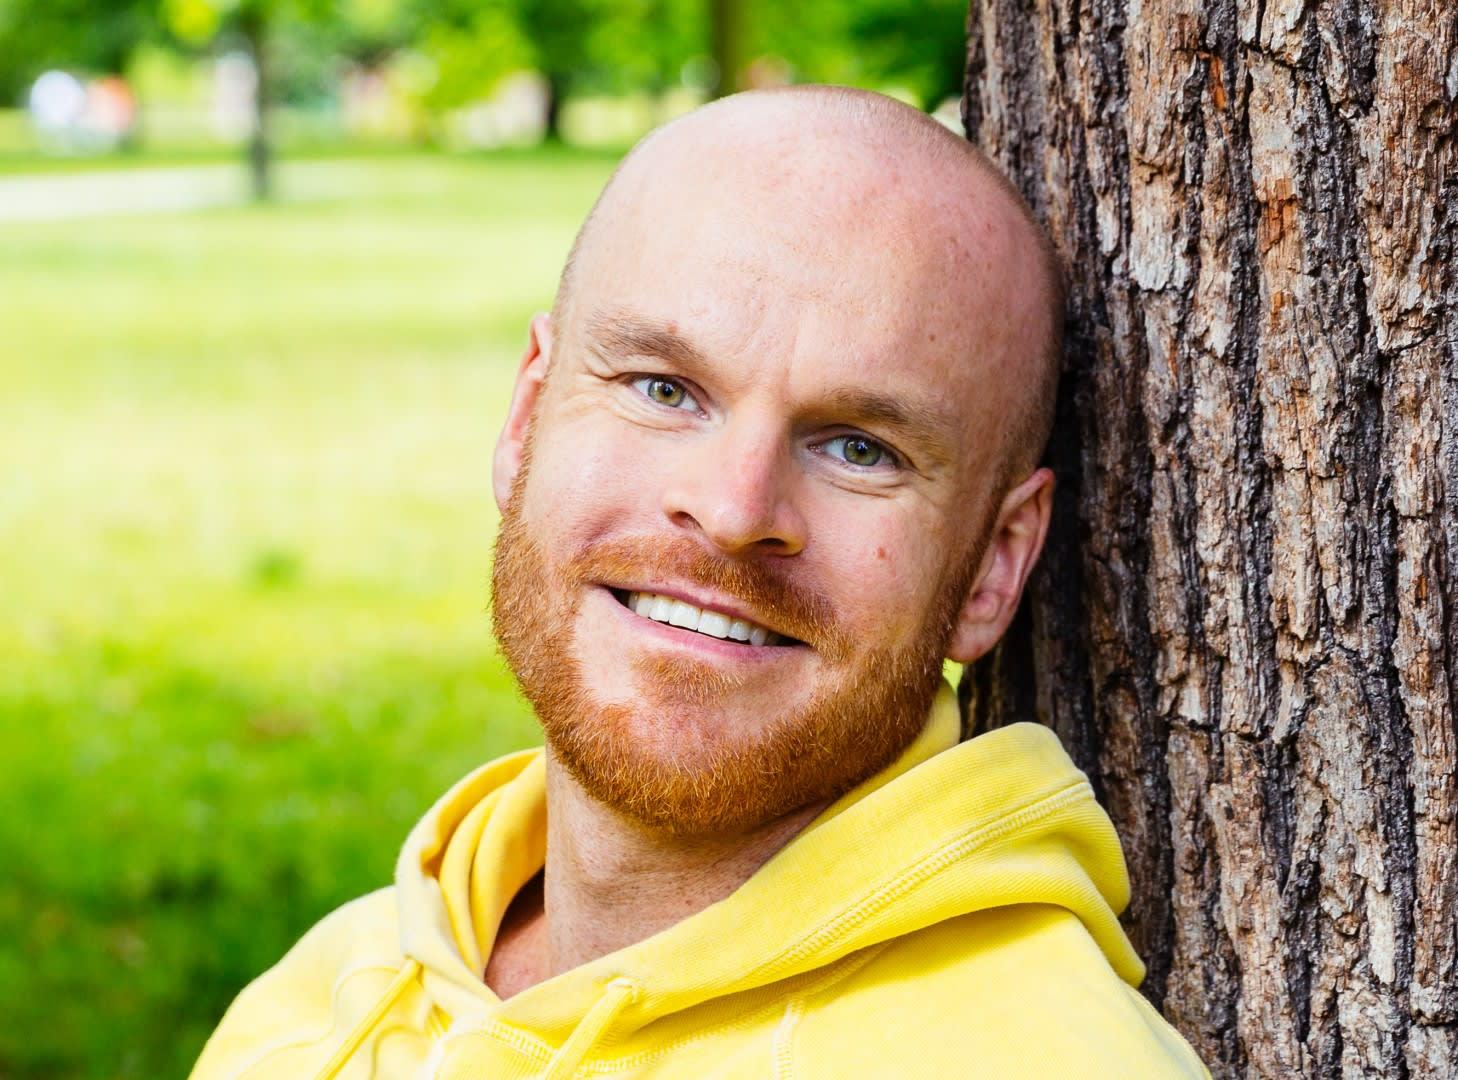 Oxford Unfiltered Philip Baldwin Headshot Smiling